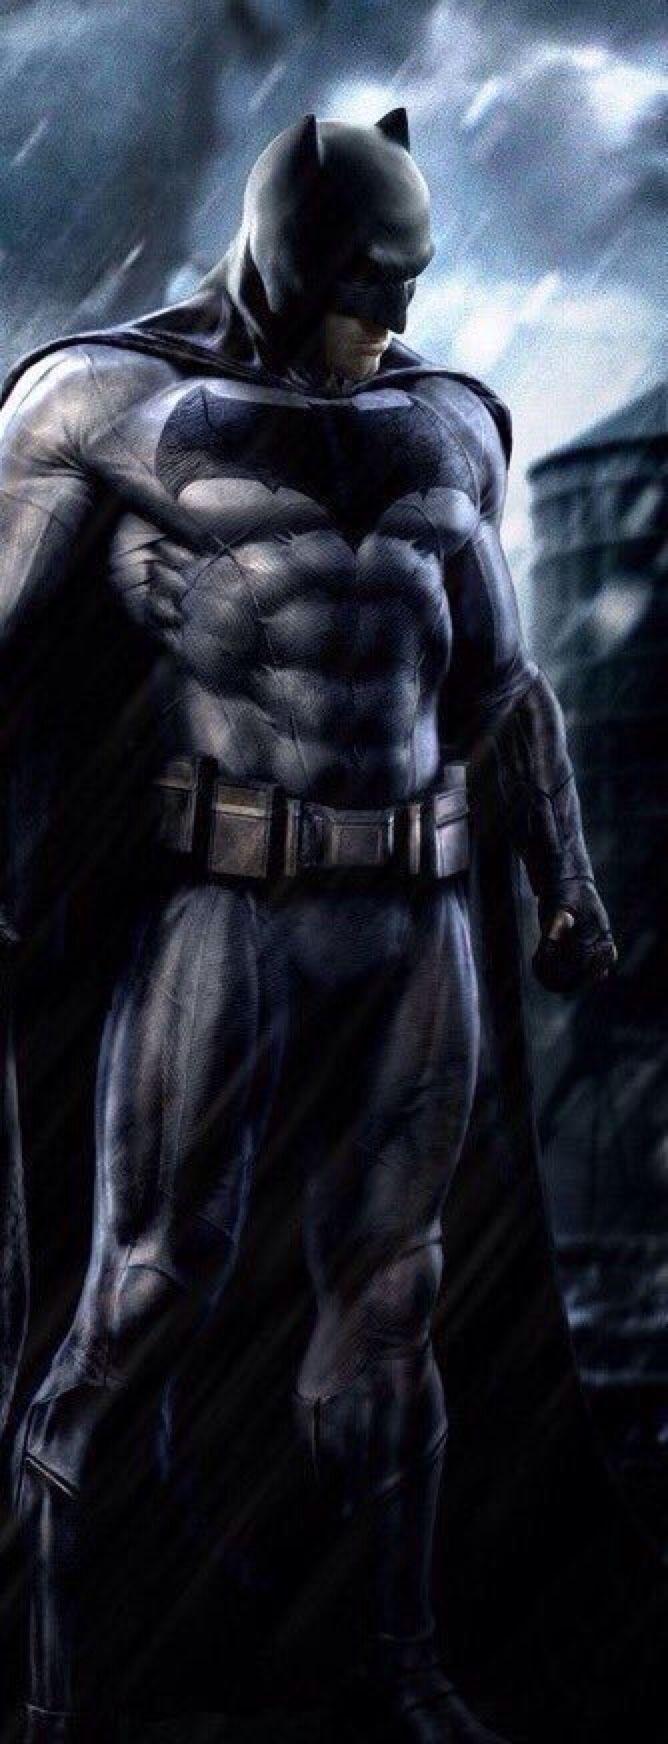 Eye Blog About.....Nothin' — superherofeed: Here, enjoy this Batman concept...